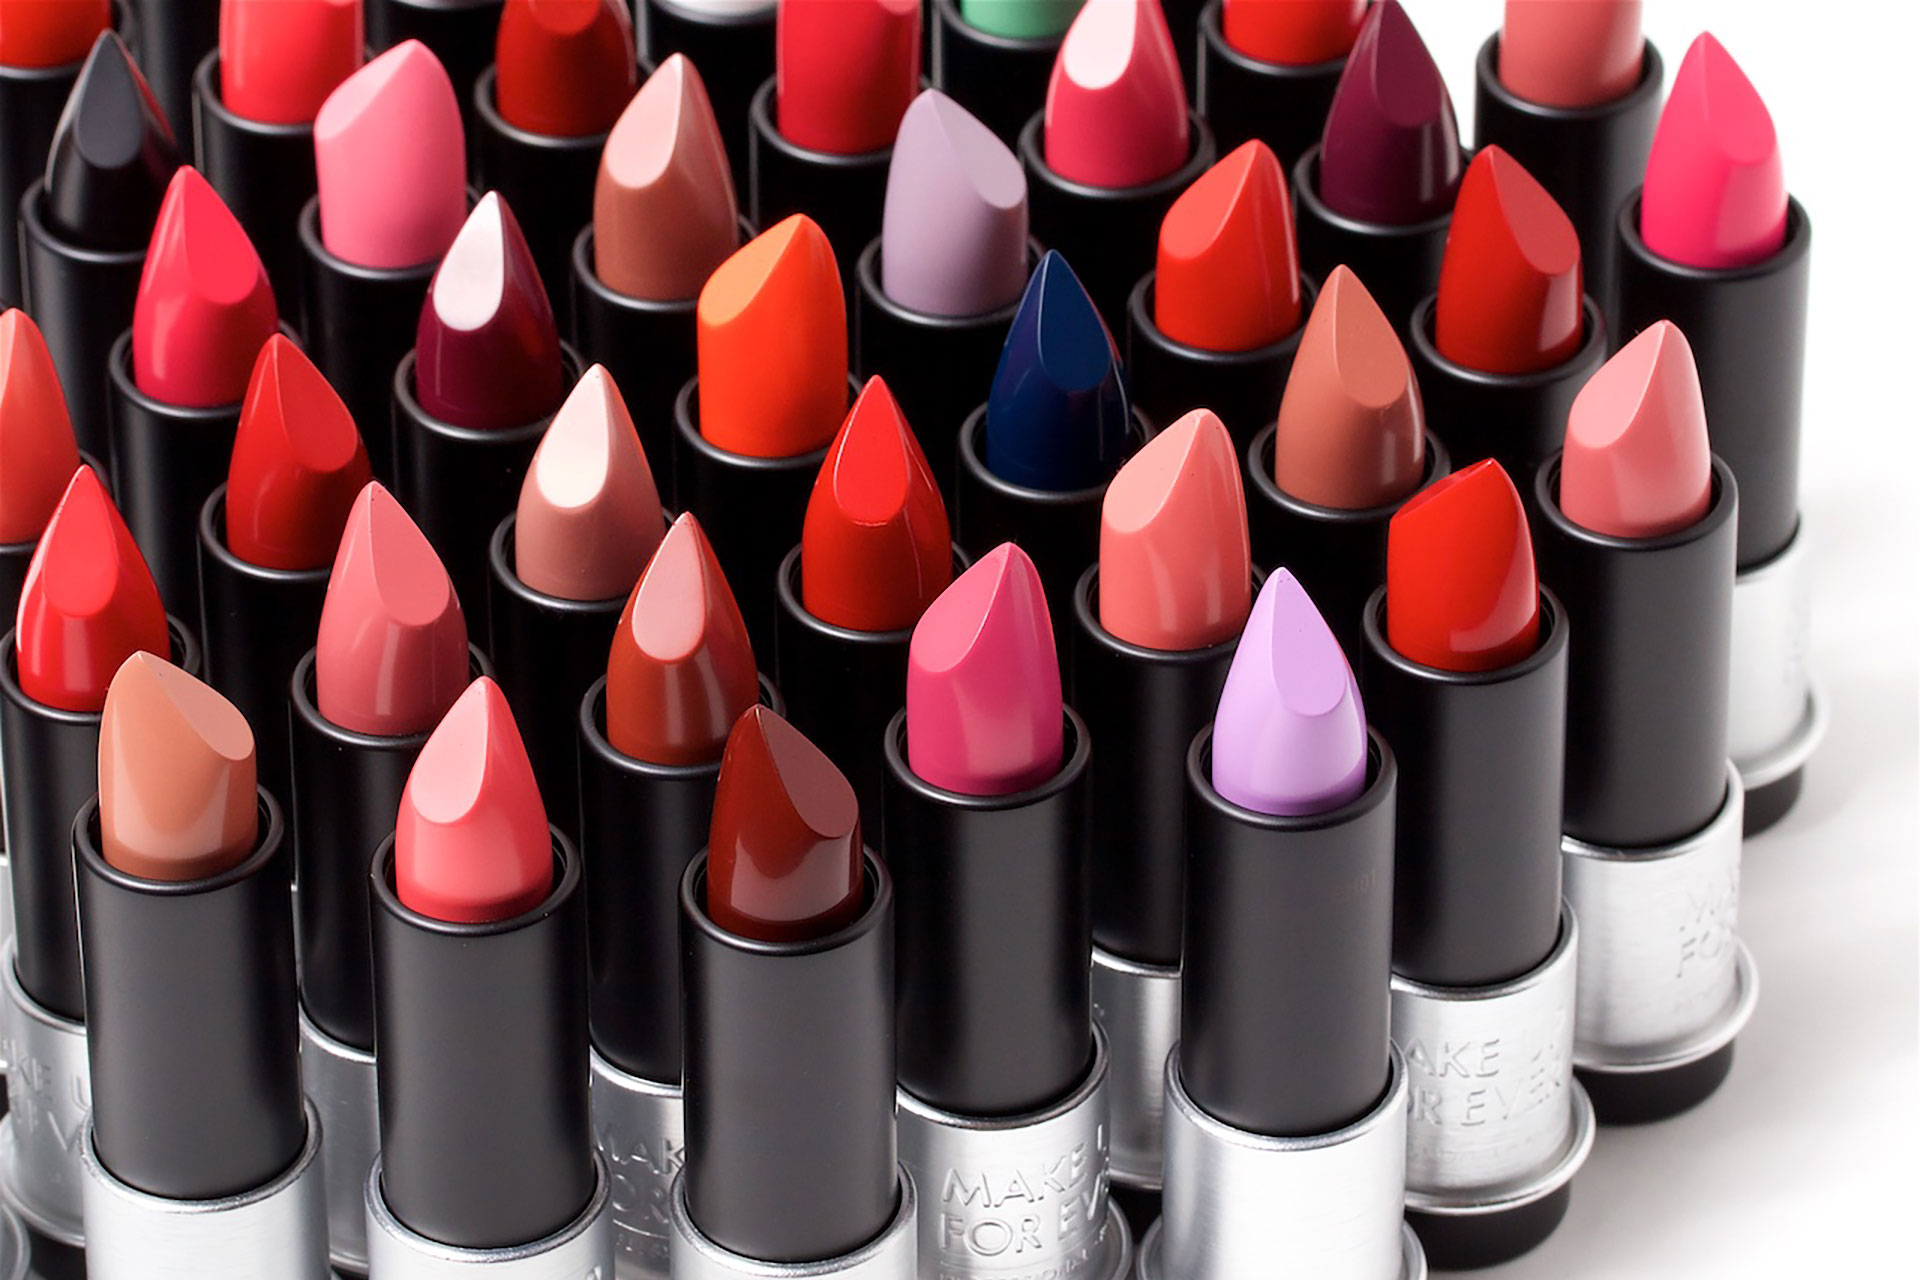 So comfort lipstick